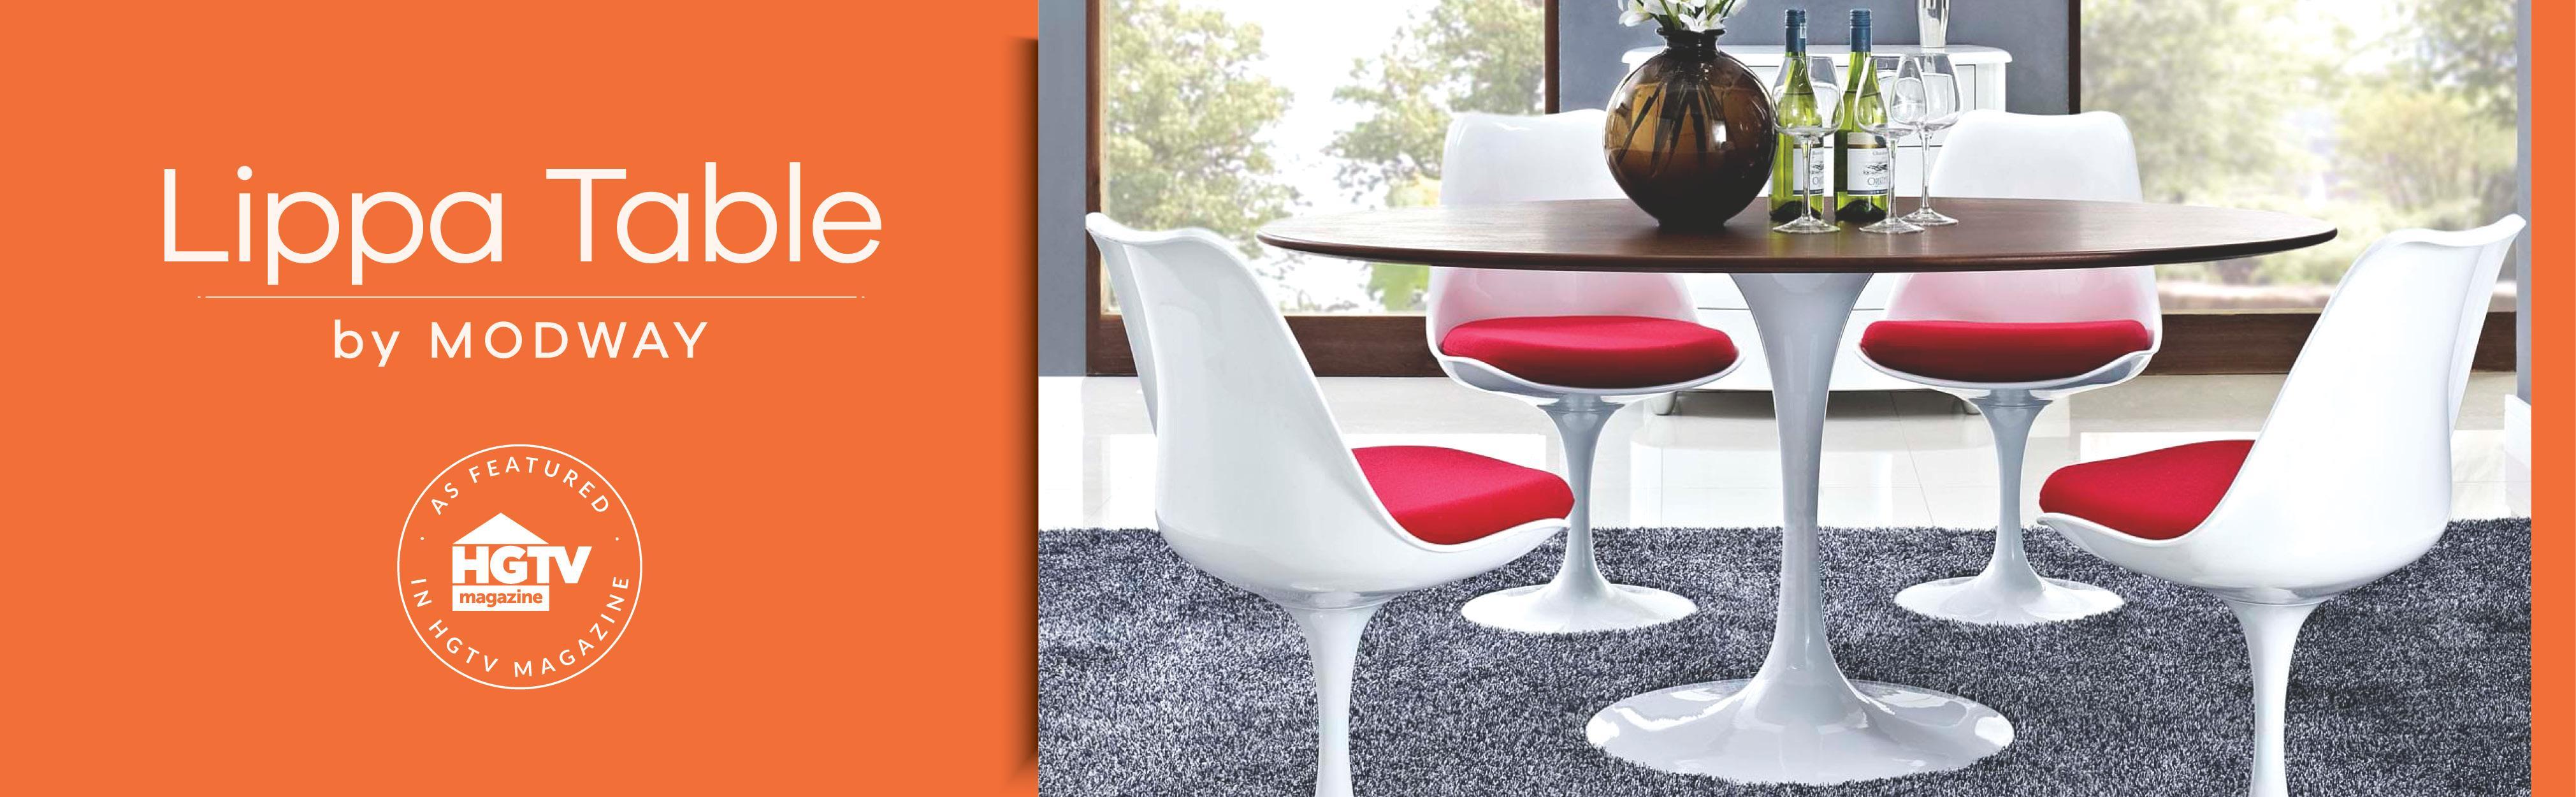 Eero Saarinen Tulip Table Lexmod White Marble Black Tulipcoffee